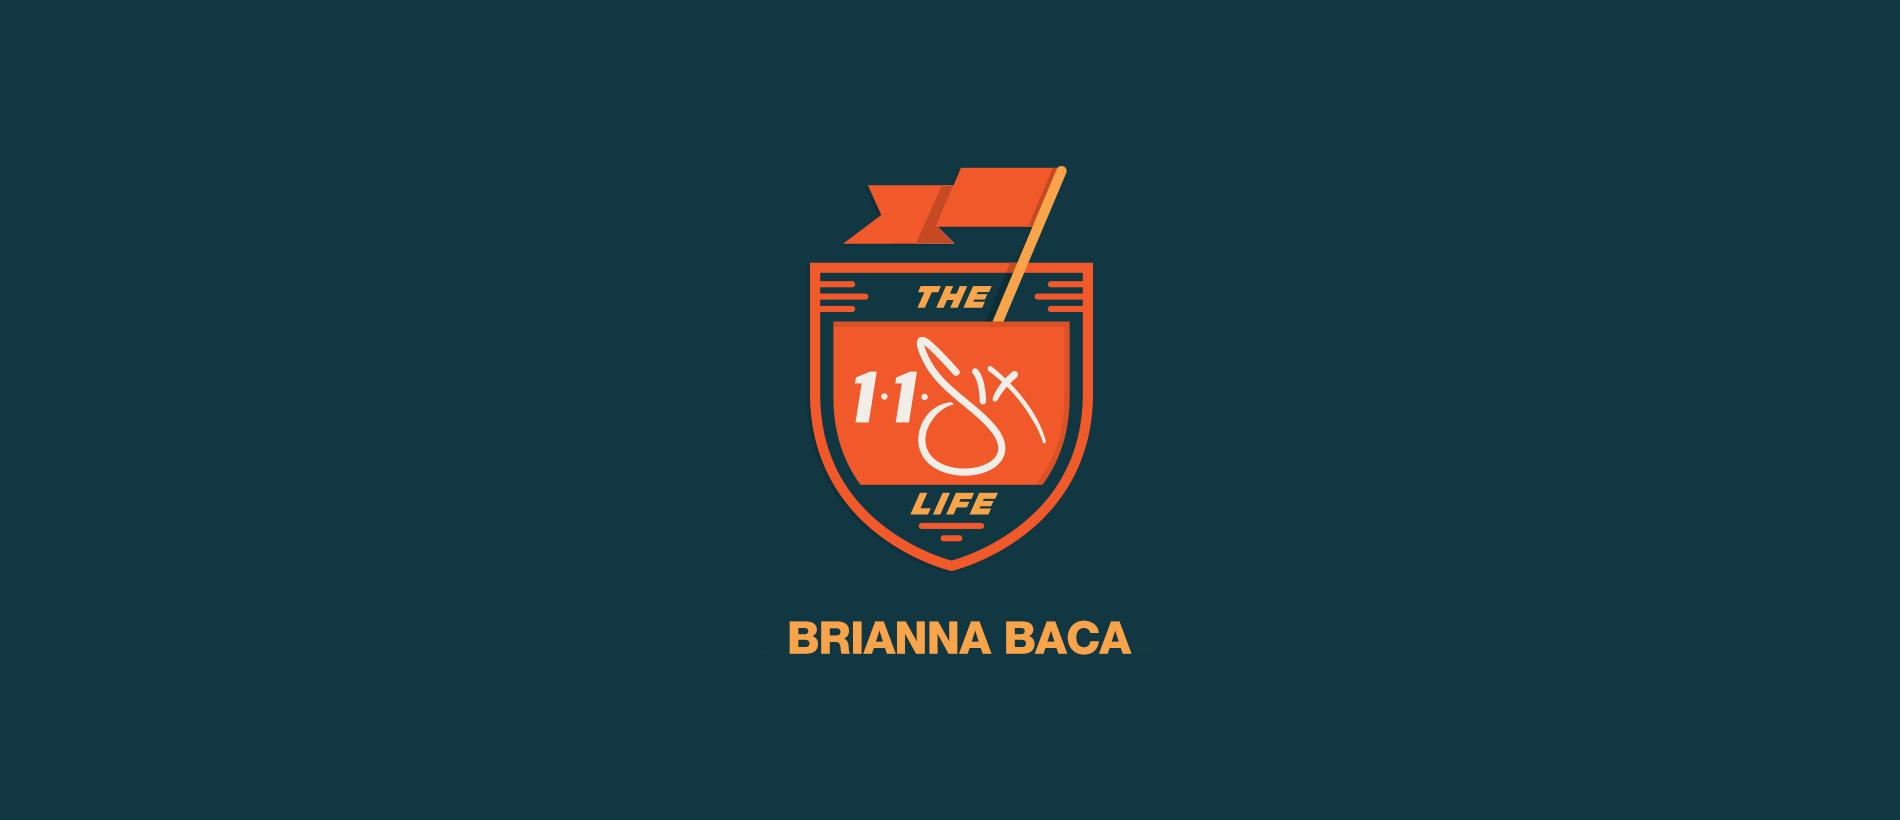 116 Life x Brianna Baca